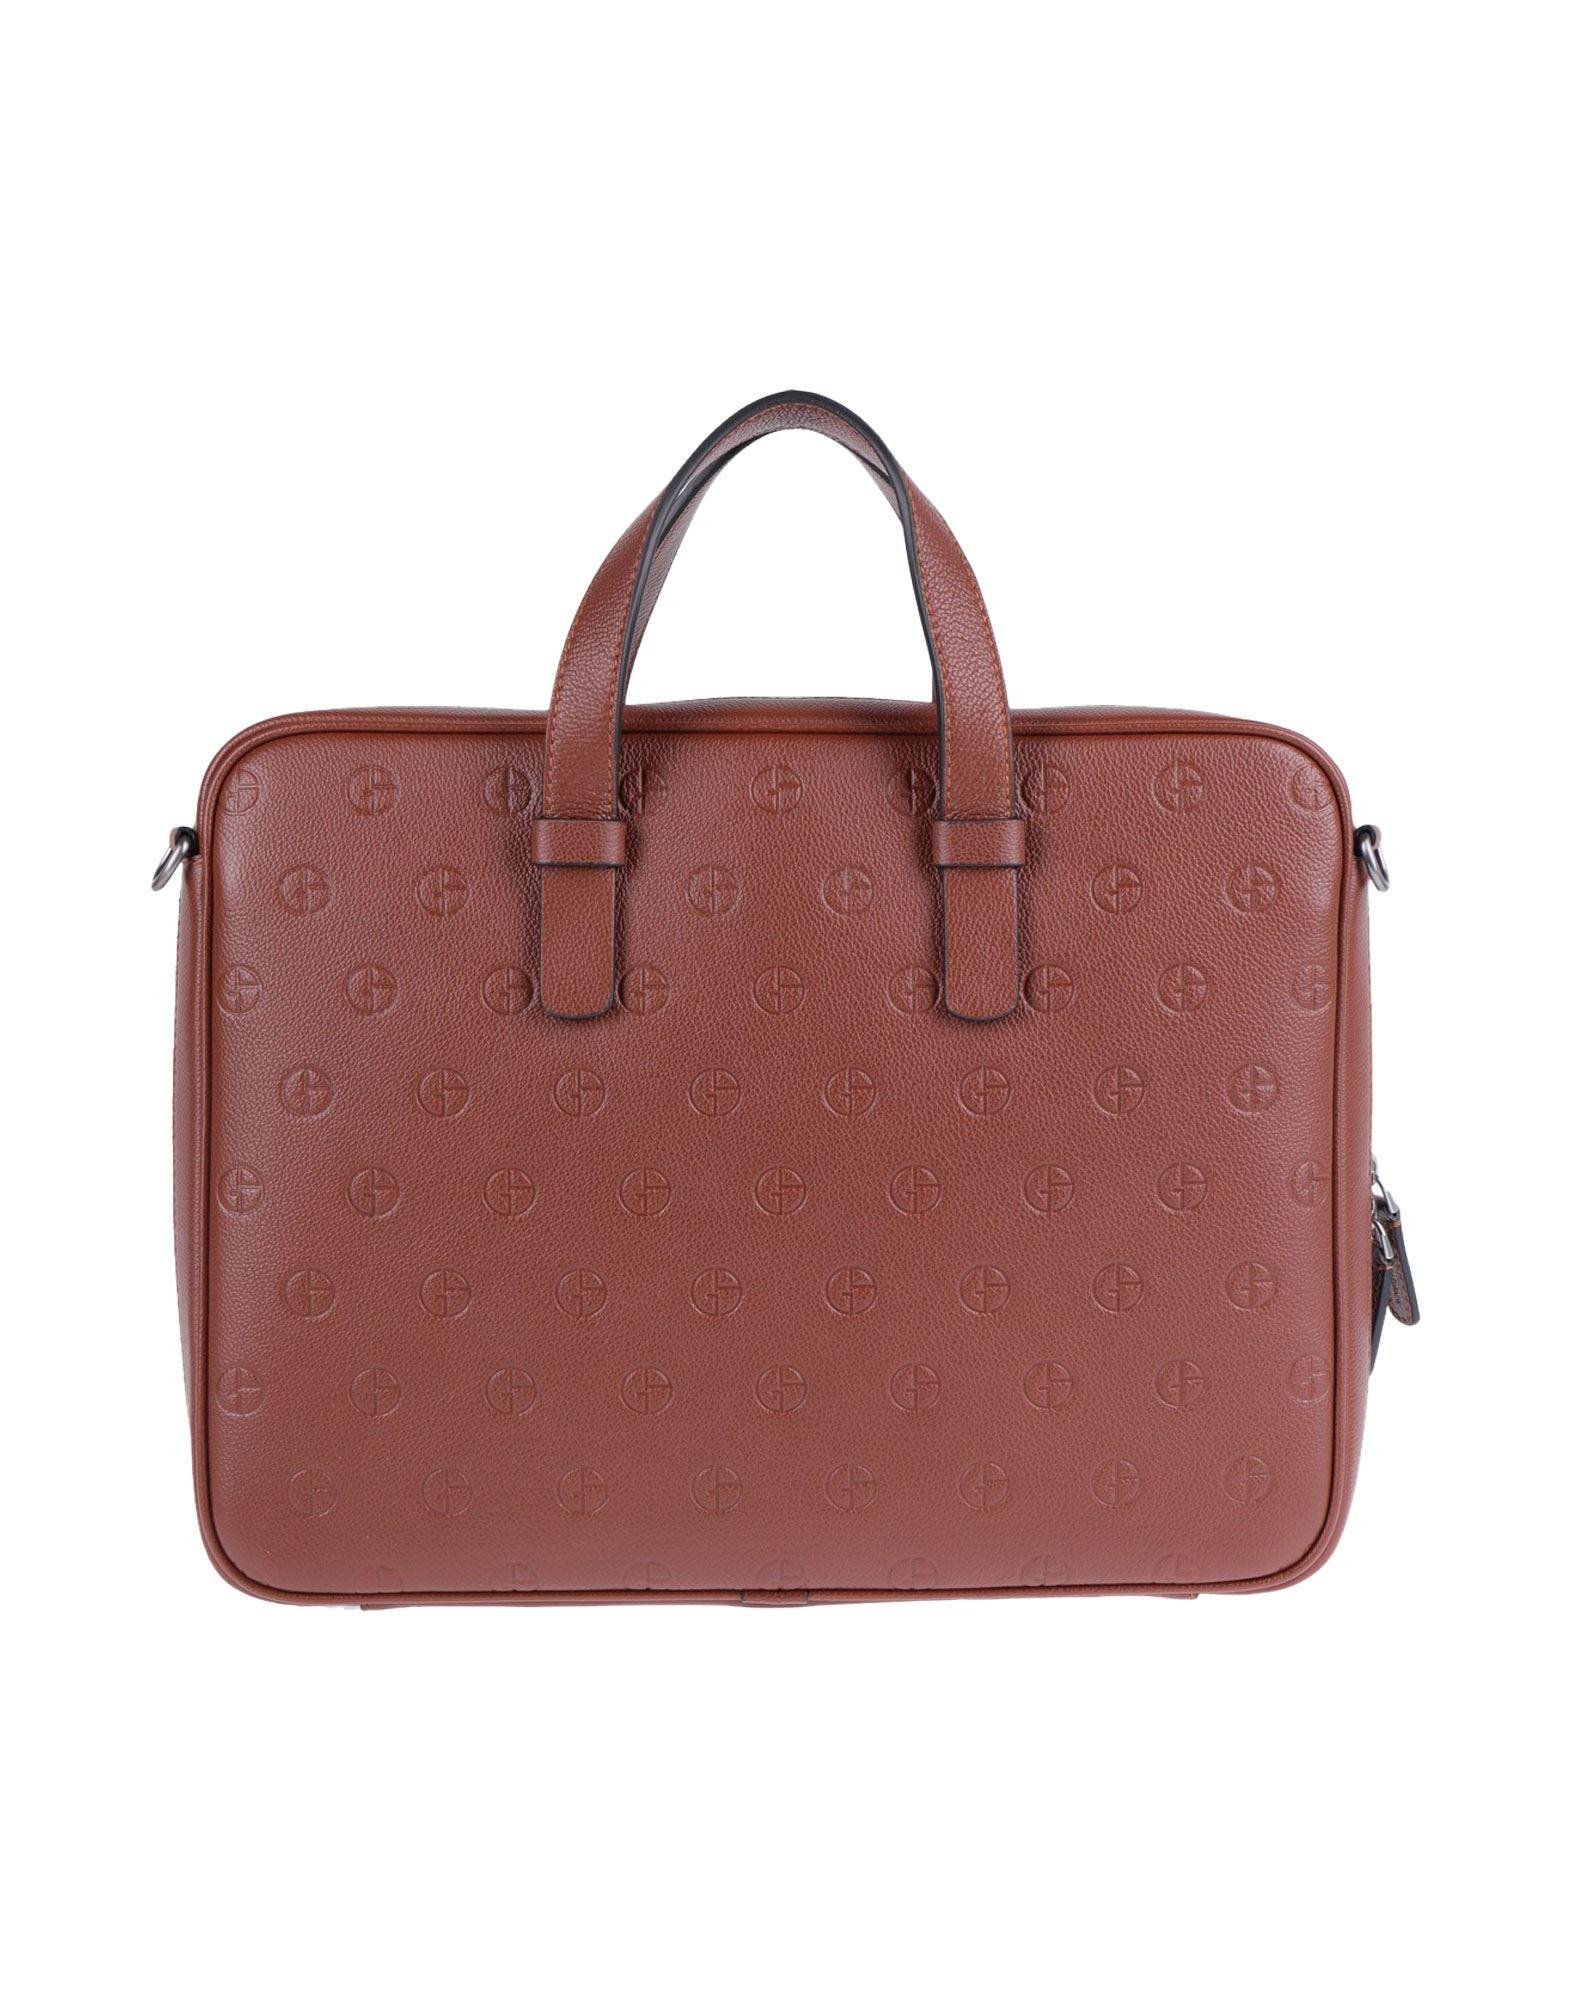 emporio armani деловые сумки GIORGIO ARMANI Деловые сумки